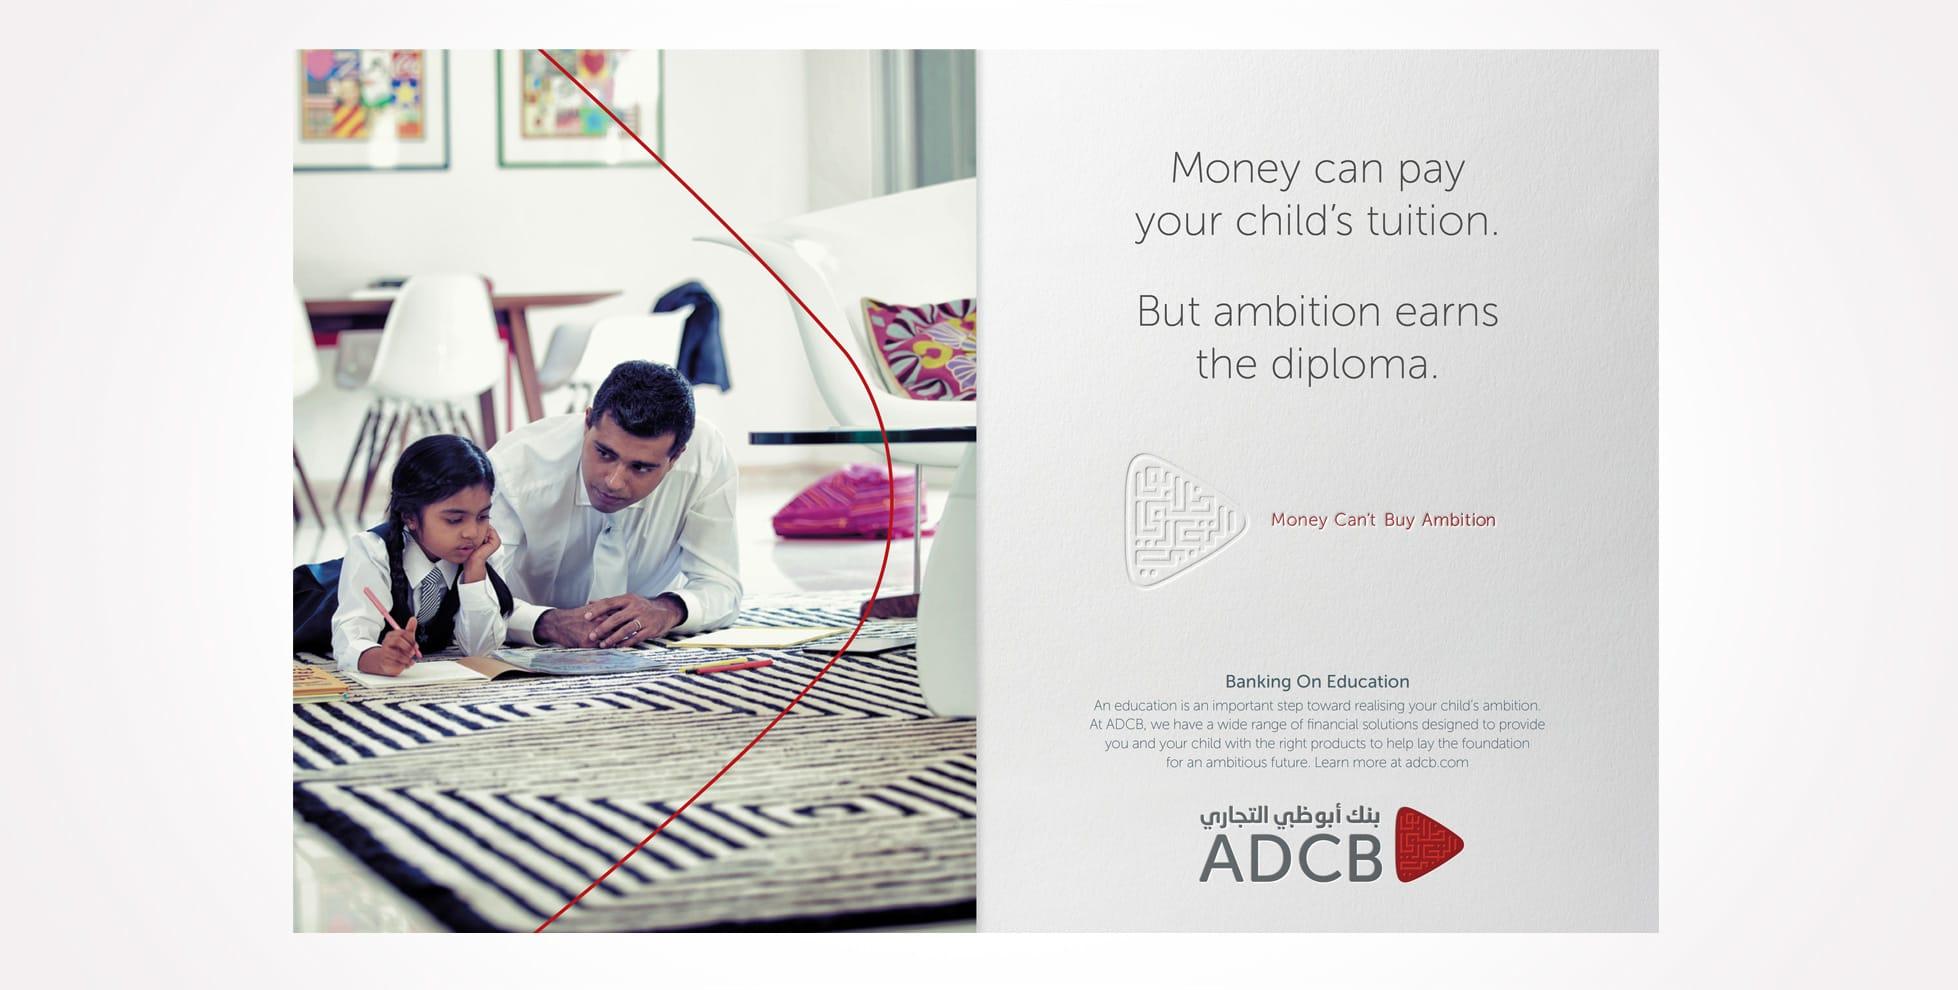 adcb_banner_design5